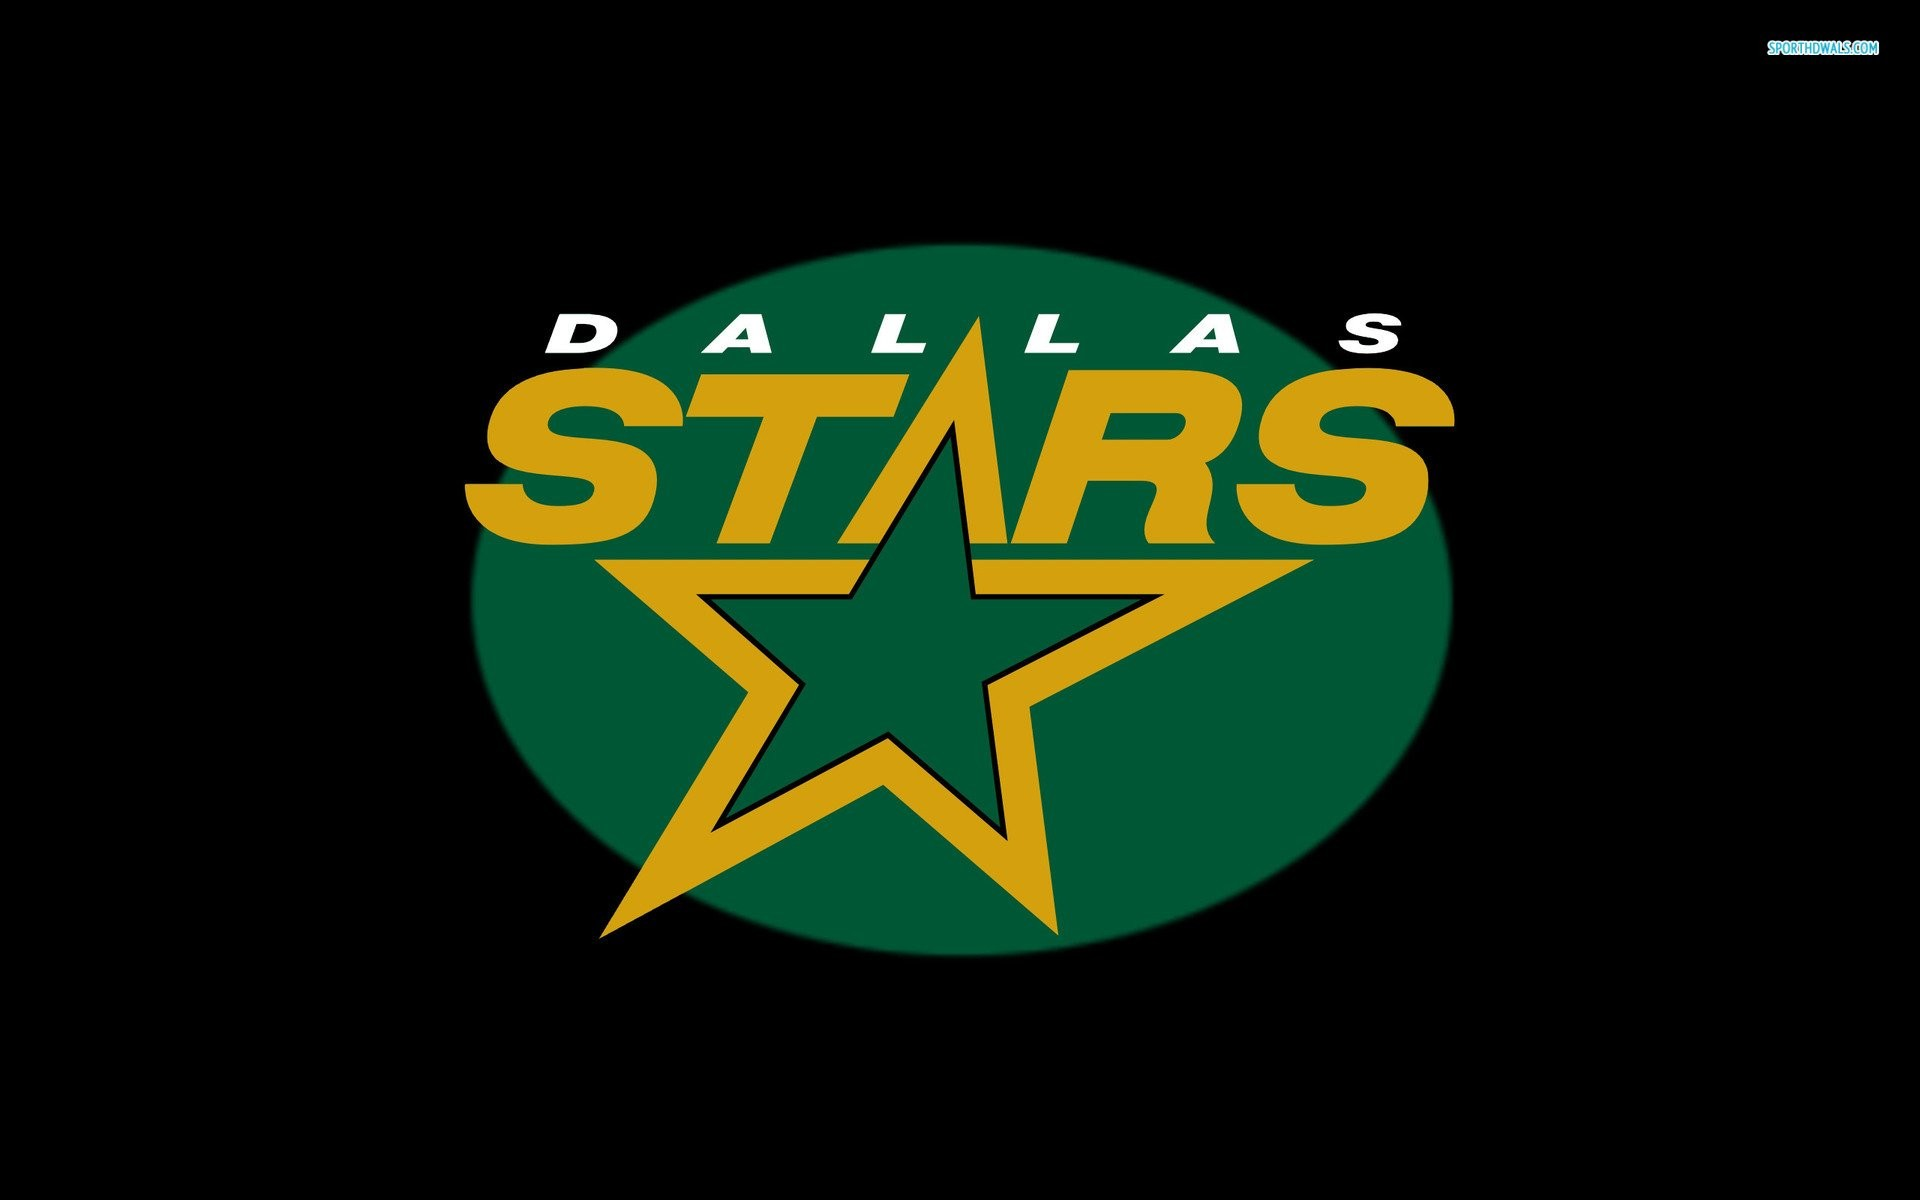 … dallas stars wallpaper 634741 walldevil …